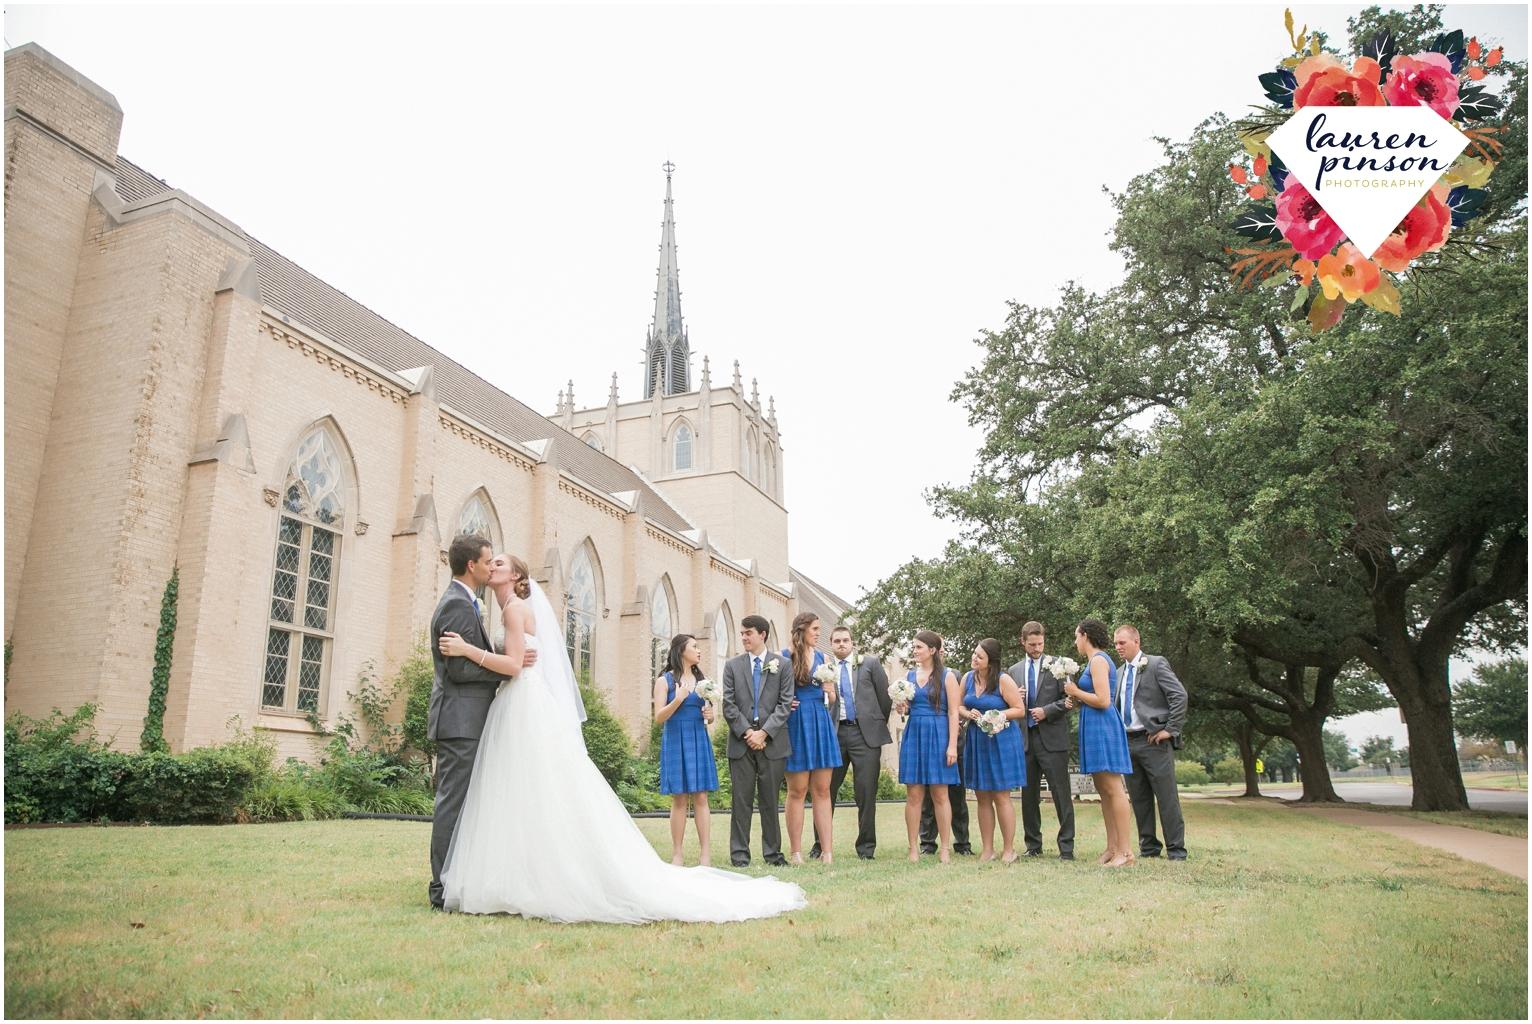 wichita-falls-wedding-photography-at-fain-presbyterian-church-and-the-wellington-timeless-classic-modern-photographer_1164.jpg